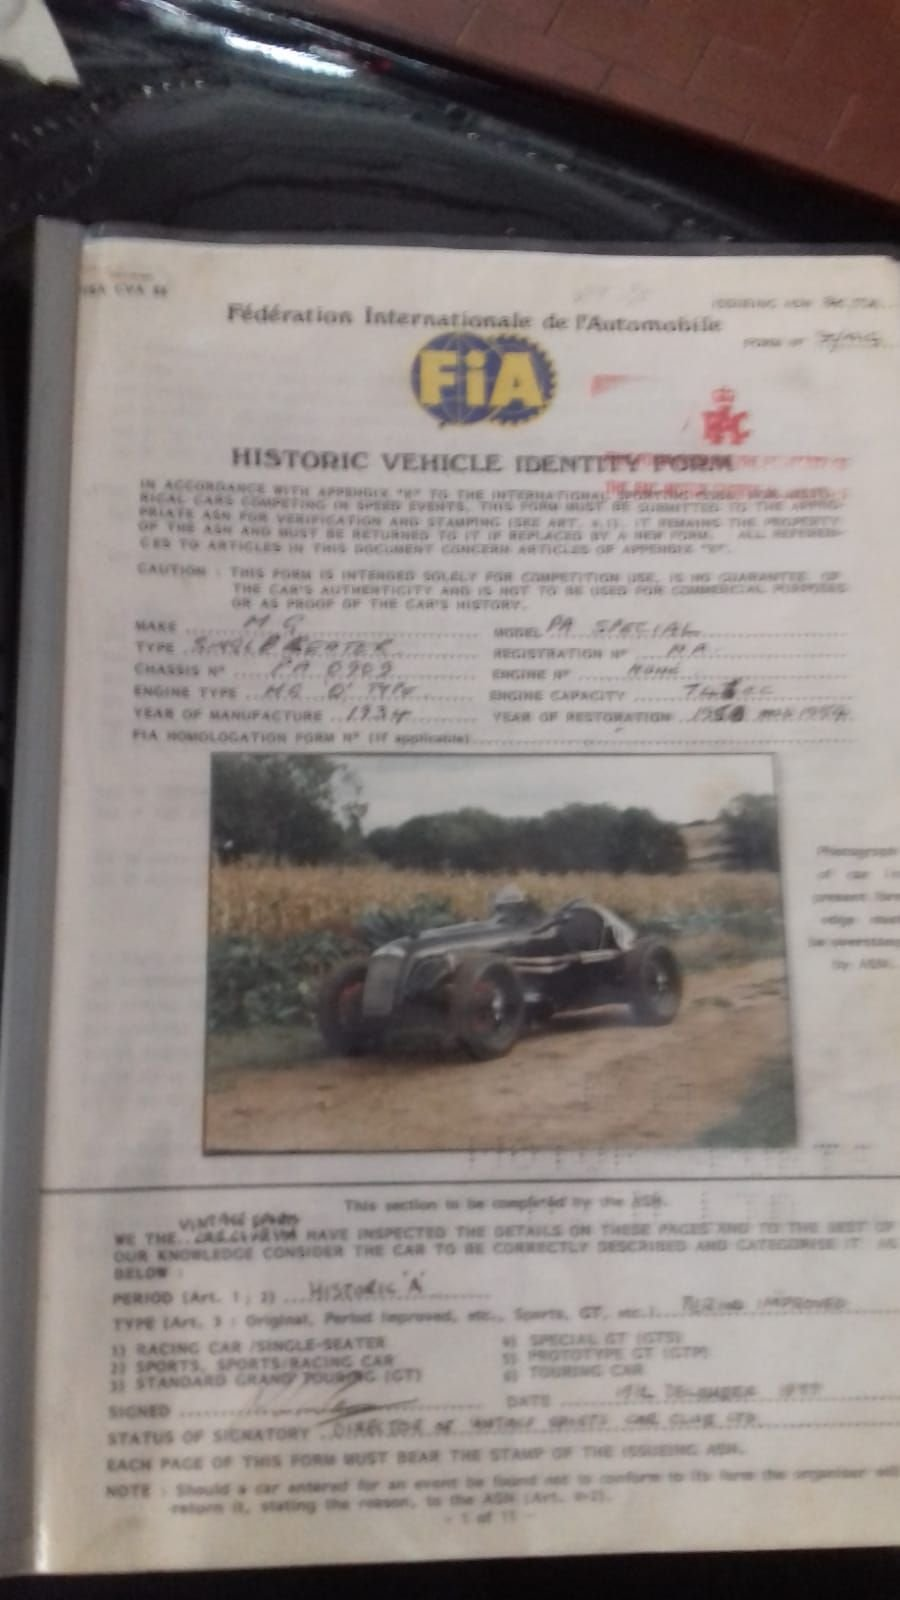 MG PA SINGLE SEATER 1934 FIA Fiche +Palmares -Volum. Compr. For Sale (picture 5 of 6)